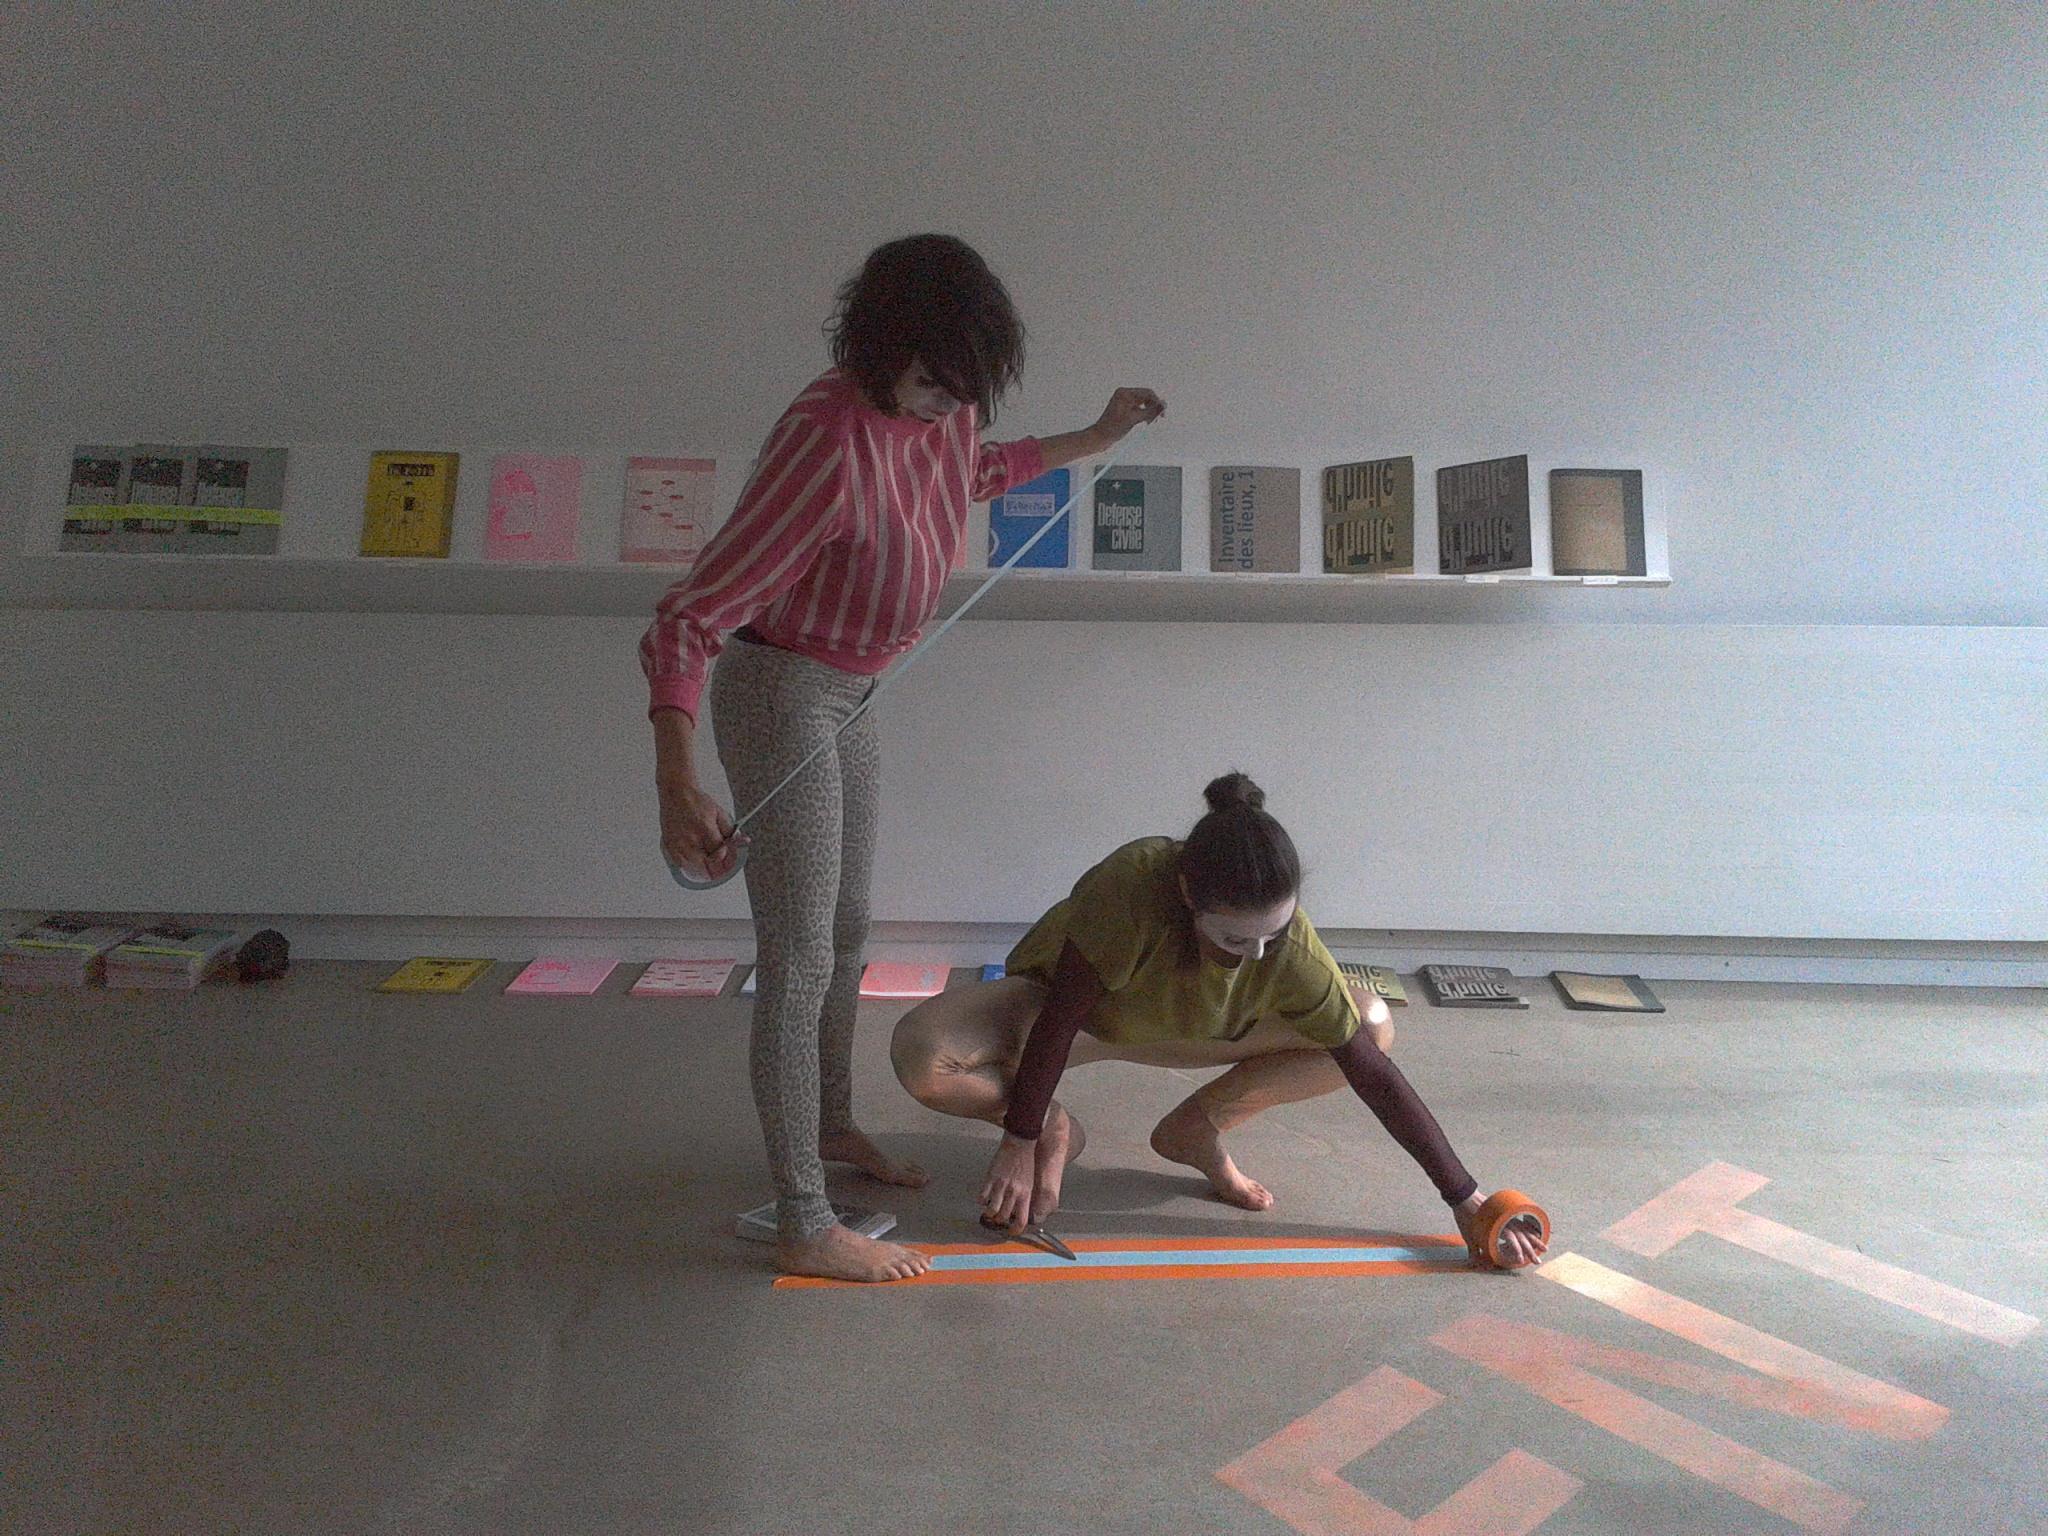 Anne Sylvie Henchoz, Chorégraphie en forme de cadre, perf  ormance'view Usine Kugler, Genève, 2013,collaboration with Charlotte Herzig.